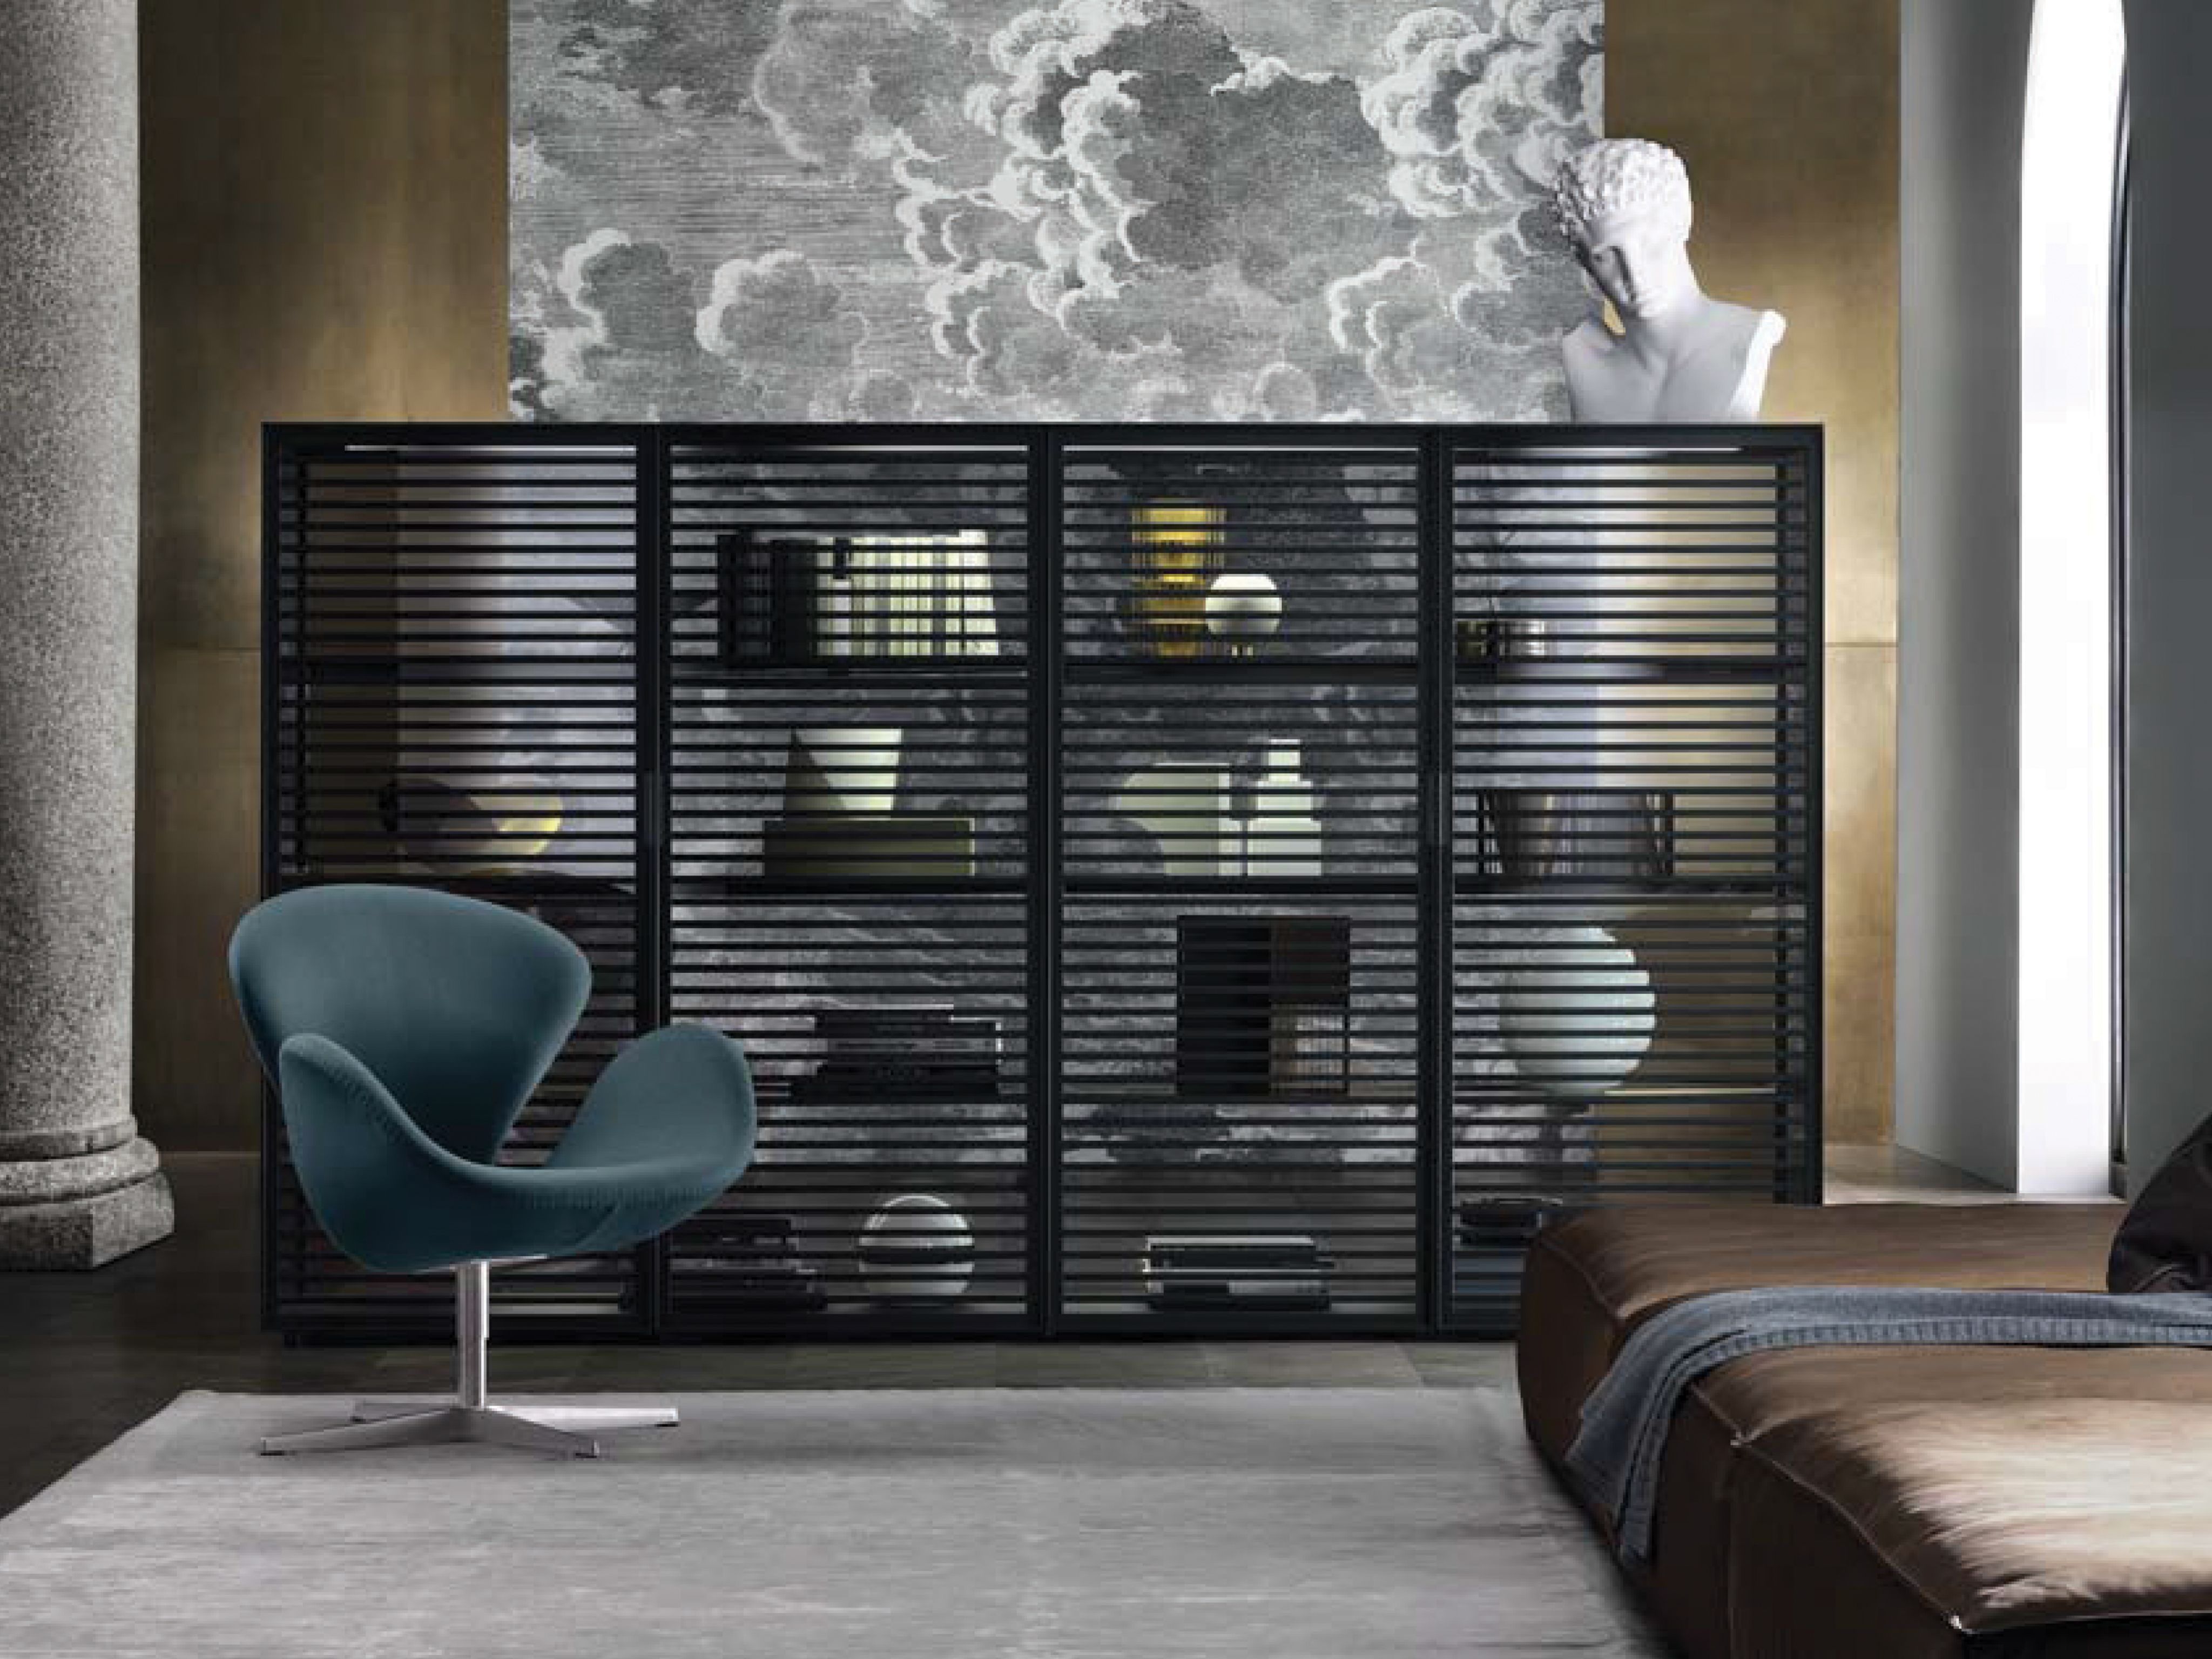 Rimadesio Alambra Display Cabinet In Aluminium Design Furniture Italian Interiors Contemporary Cabinets